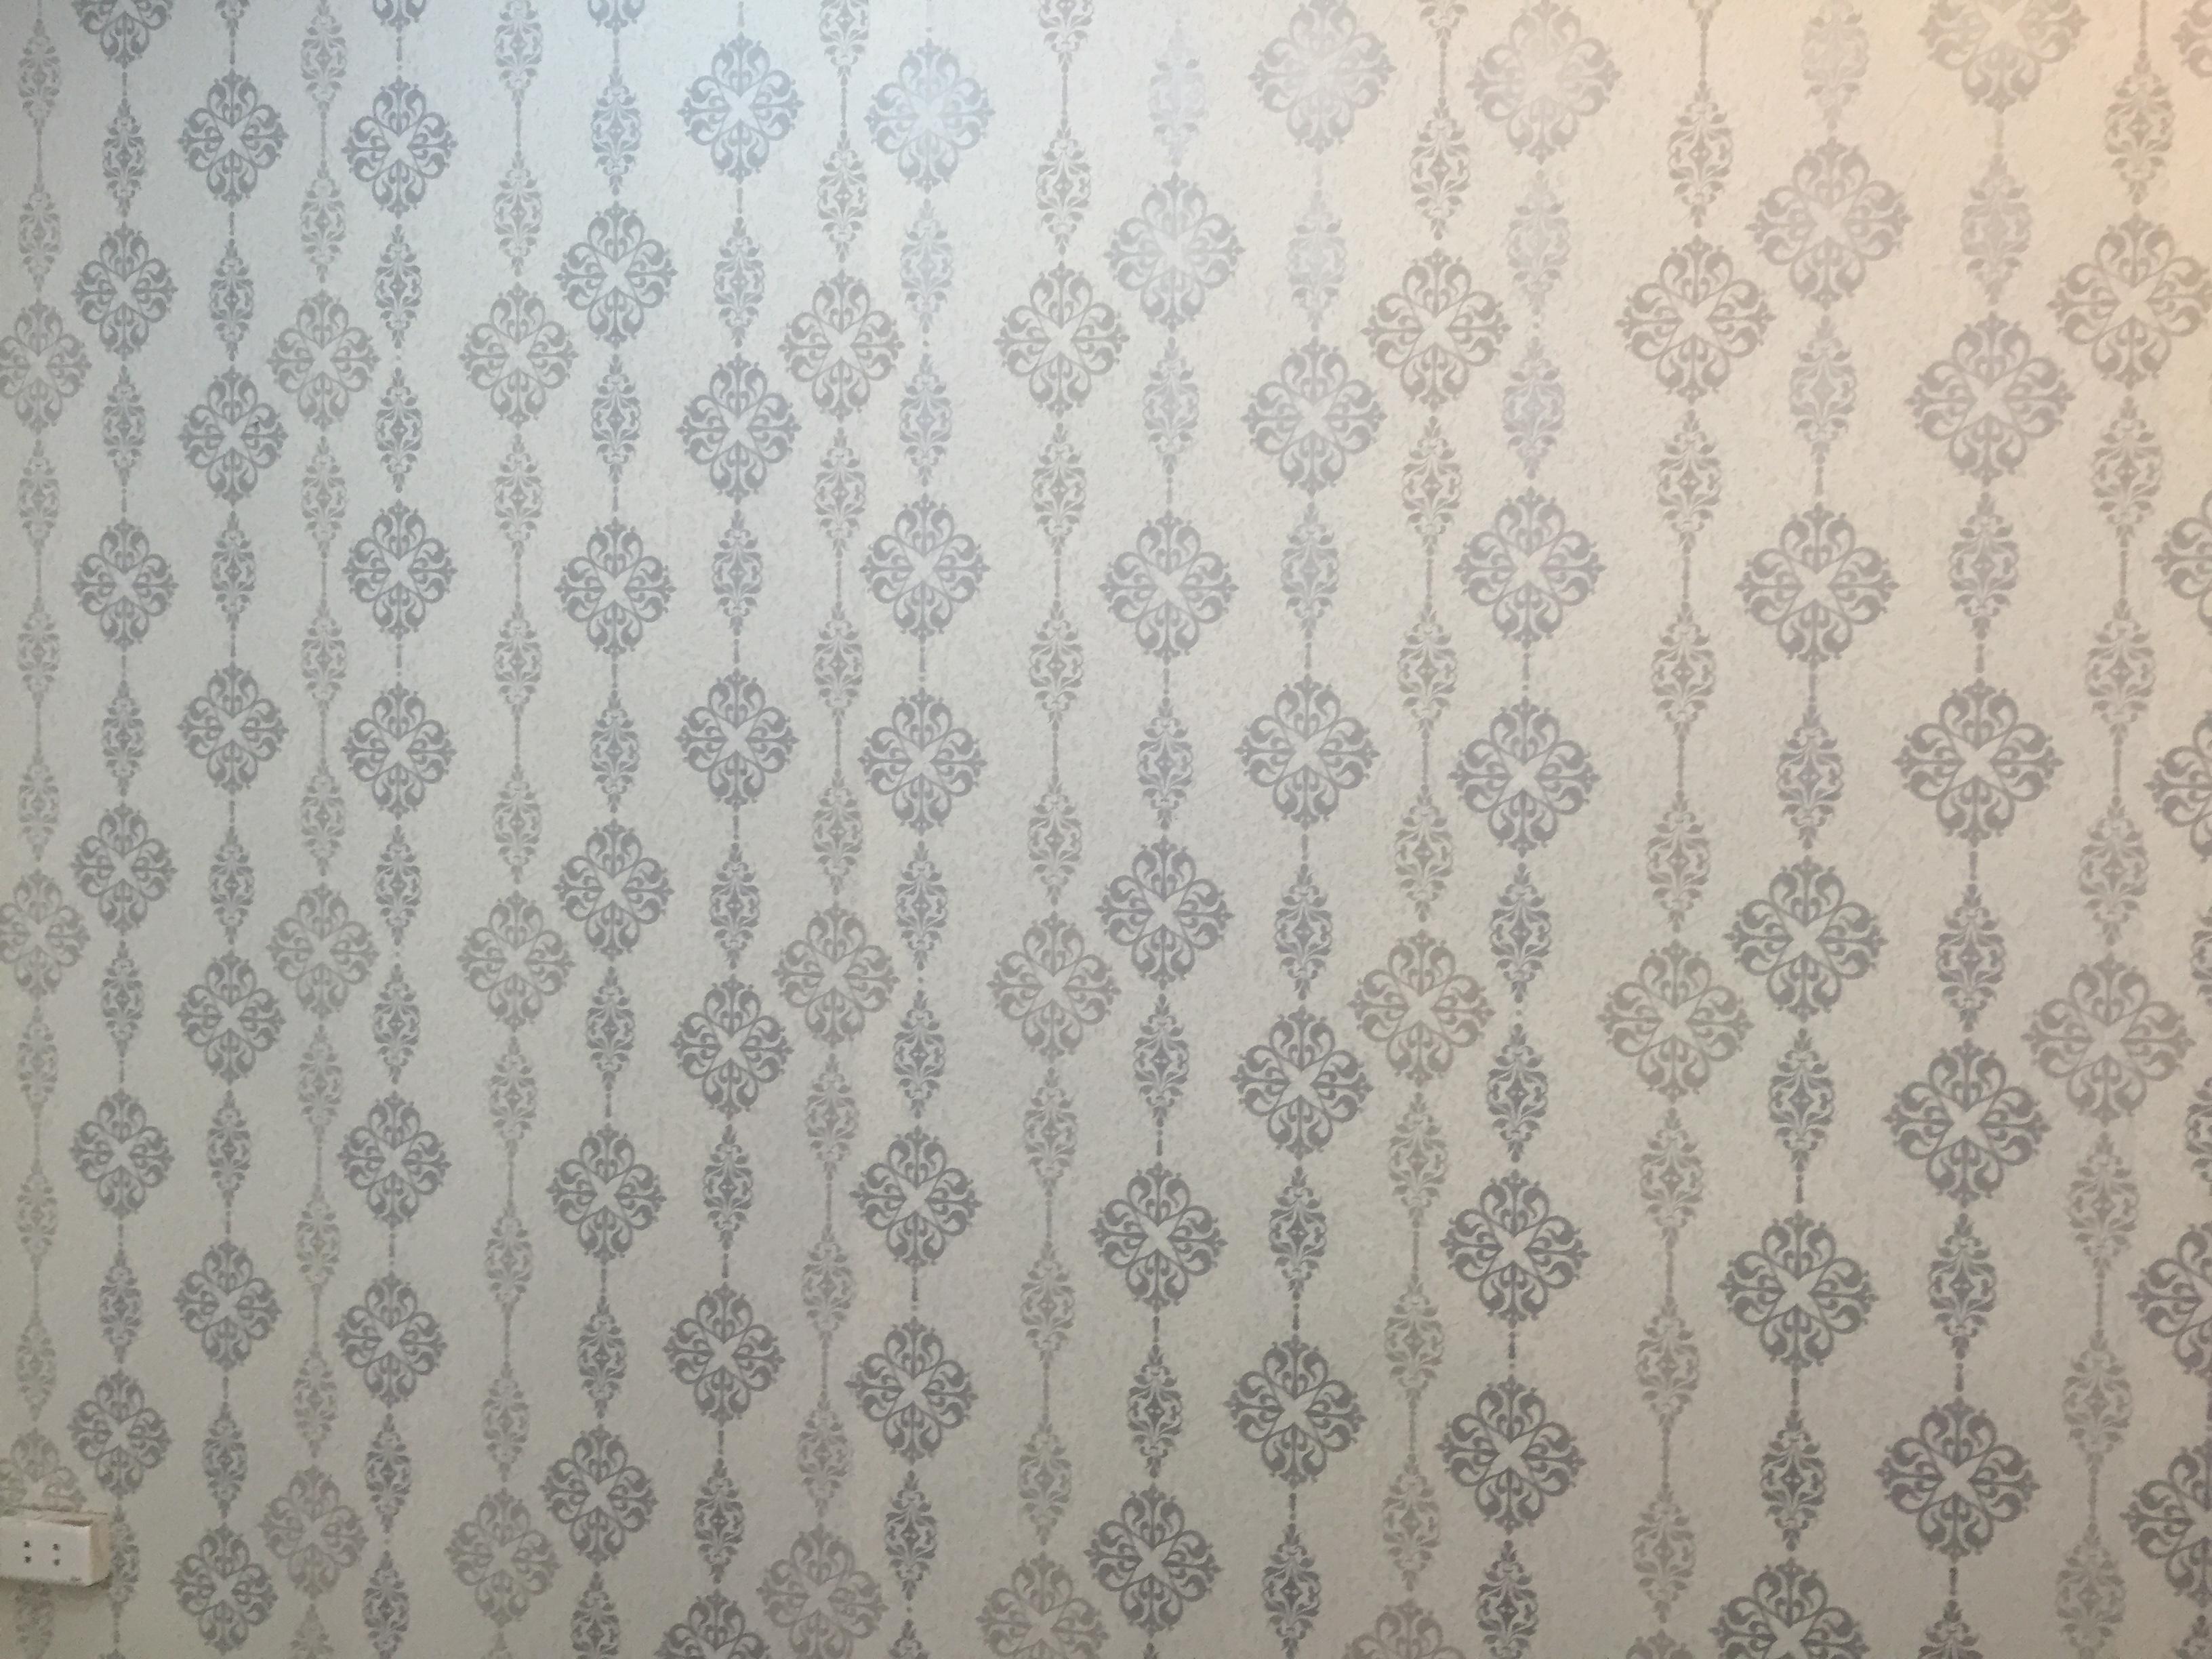 giấy decak chống ẩm